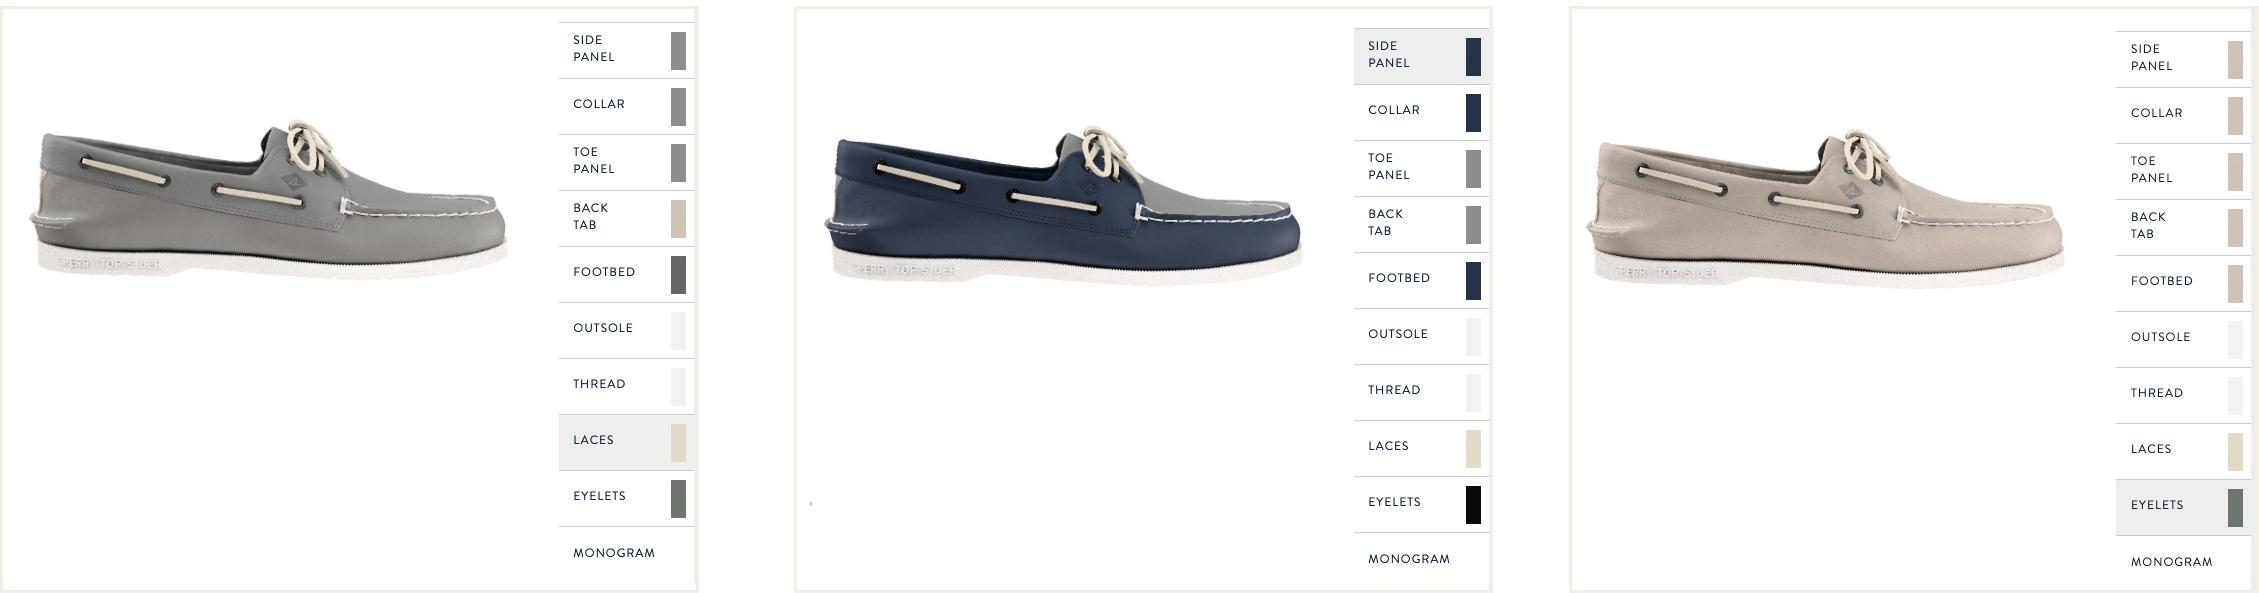 Customizable Men's Shoes